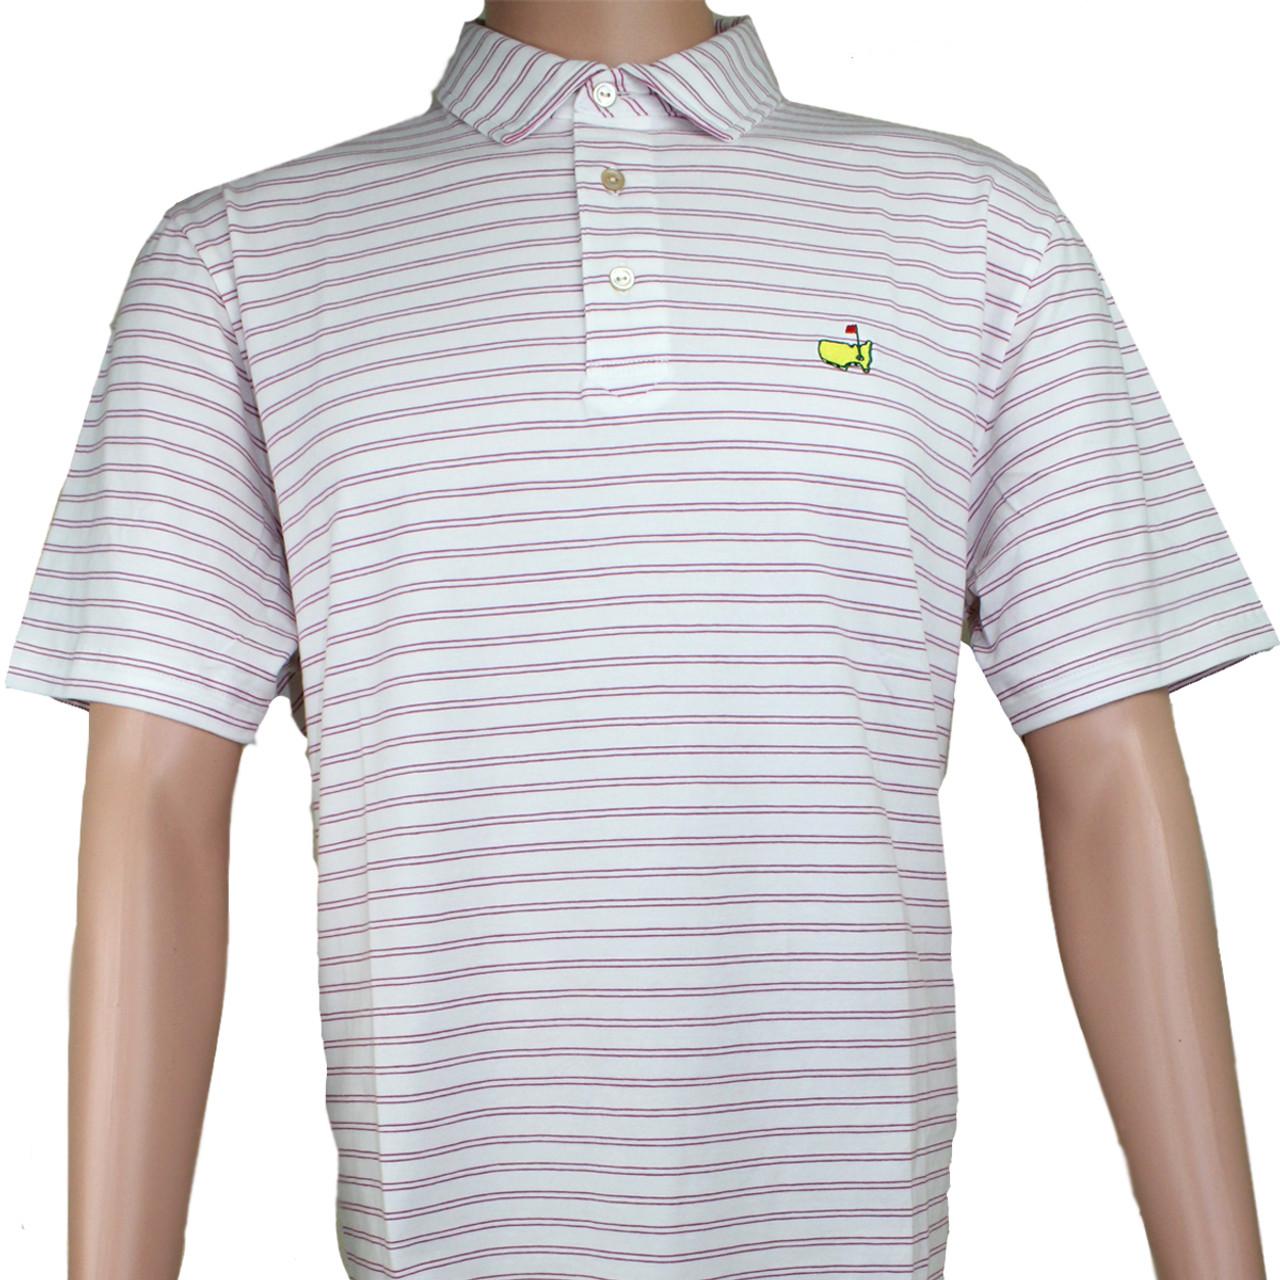 4aa9719c Masters Peter Millar White & Rosebud Jersey Golf Shirt